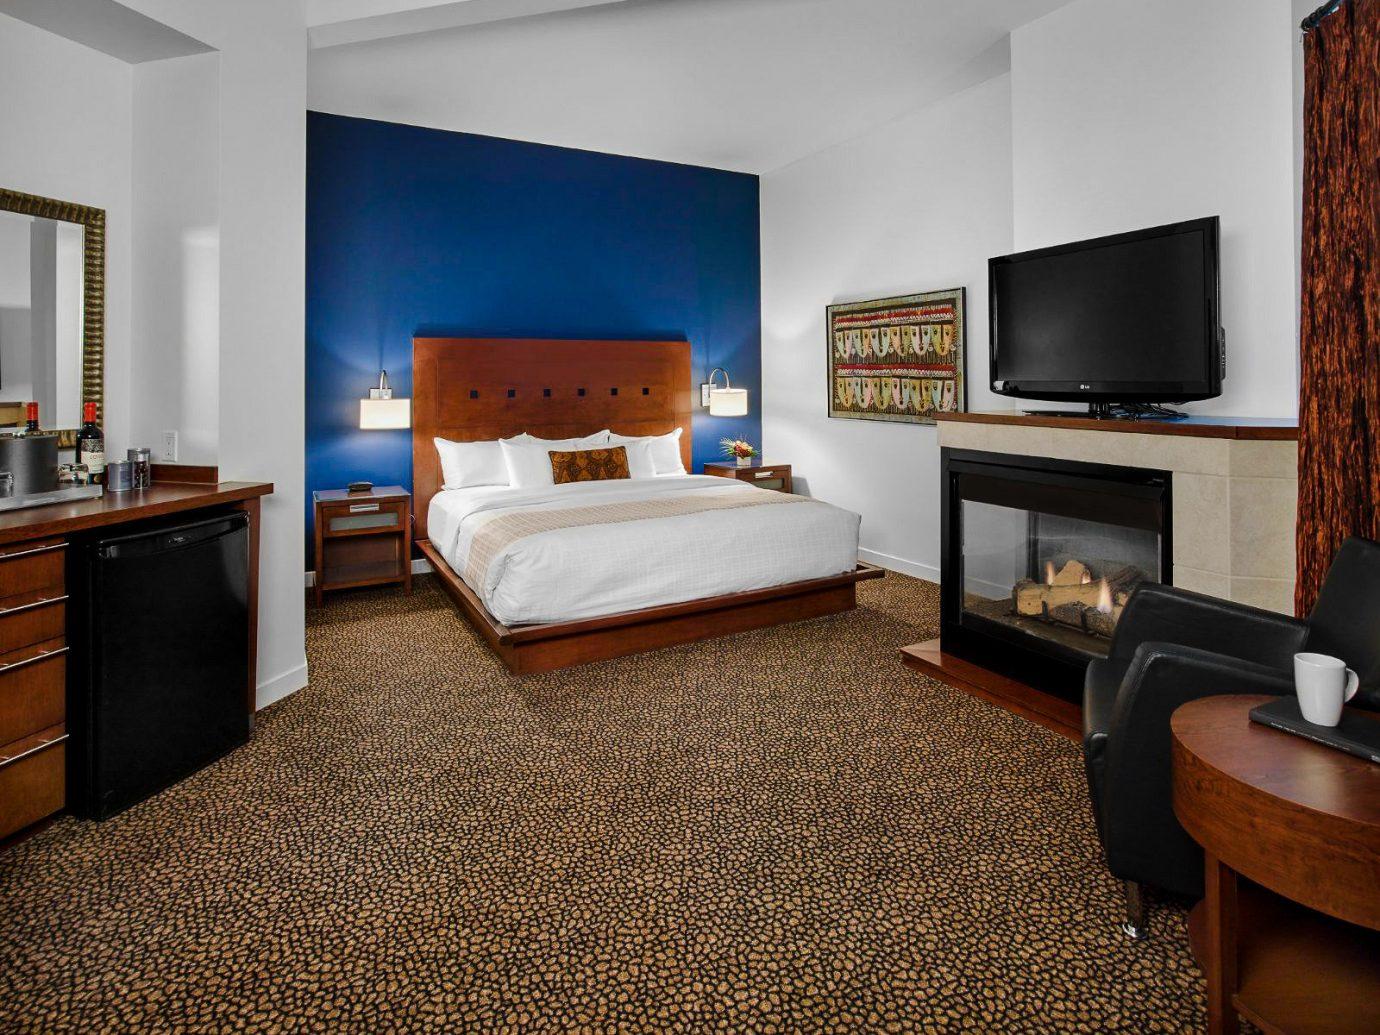 Fdy Furniture Interior Design Edmonton Ab ~ Your ultimate road trip in alberta canada jetsetter